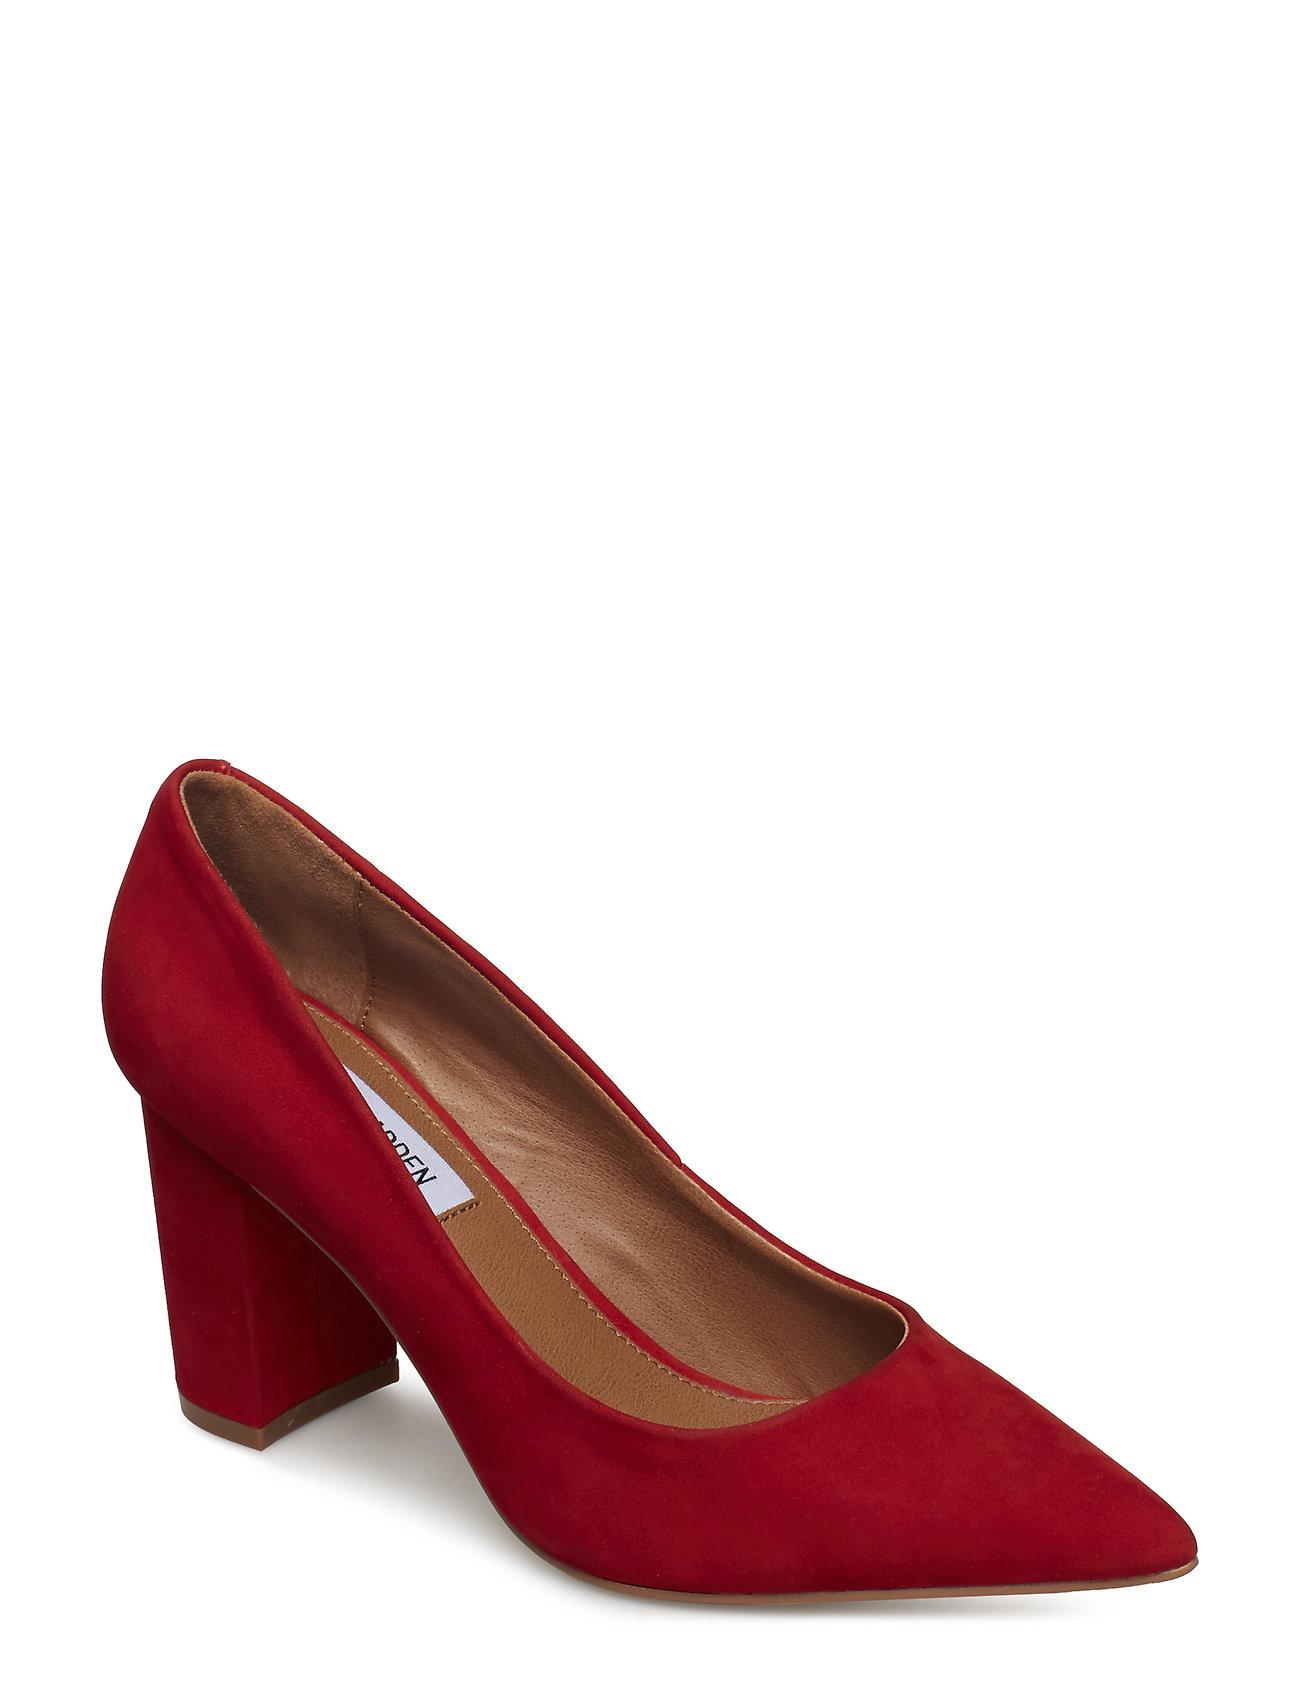 408f1a57ba3 Ashlyn Pump (Red Nubuck) (£45) - Steve Madden -